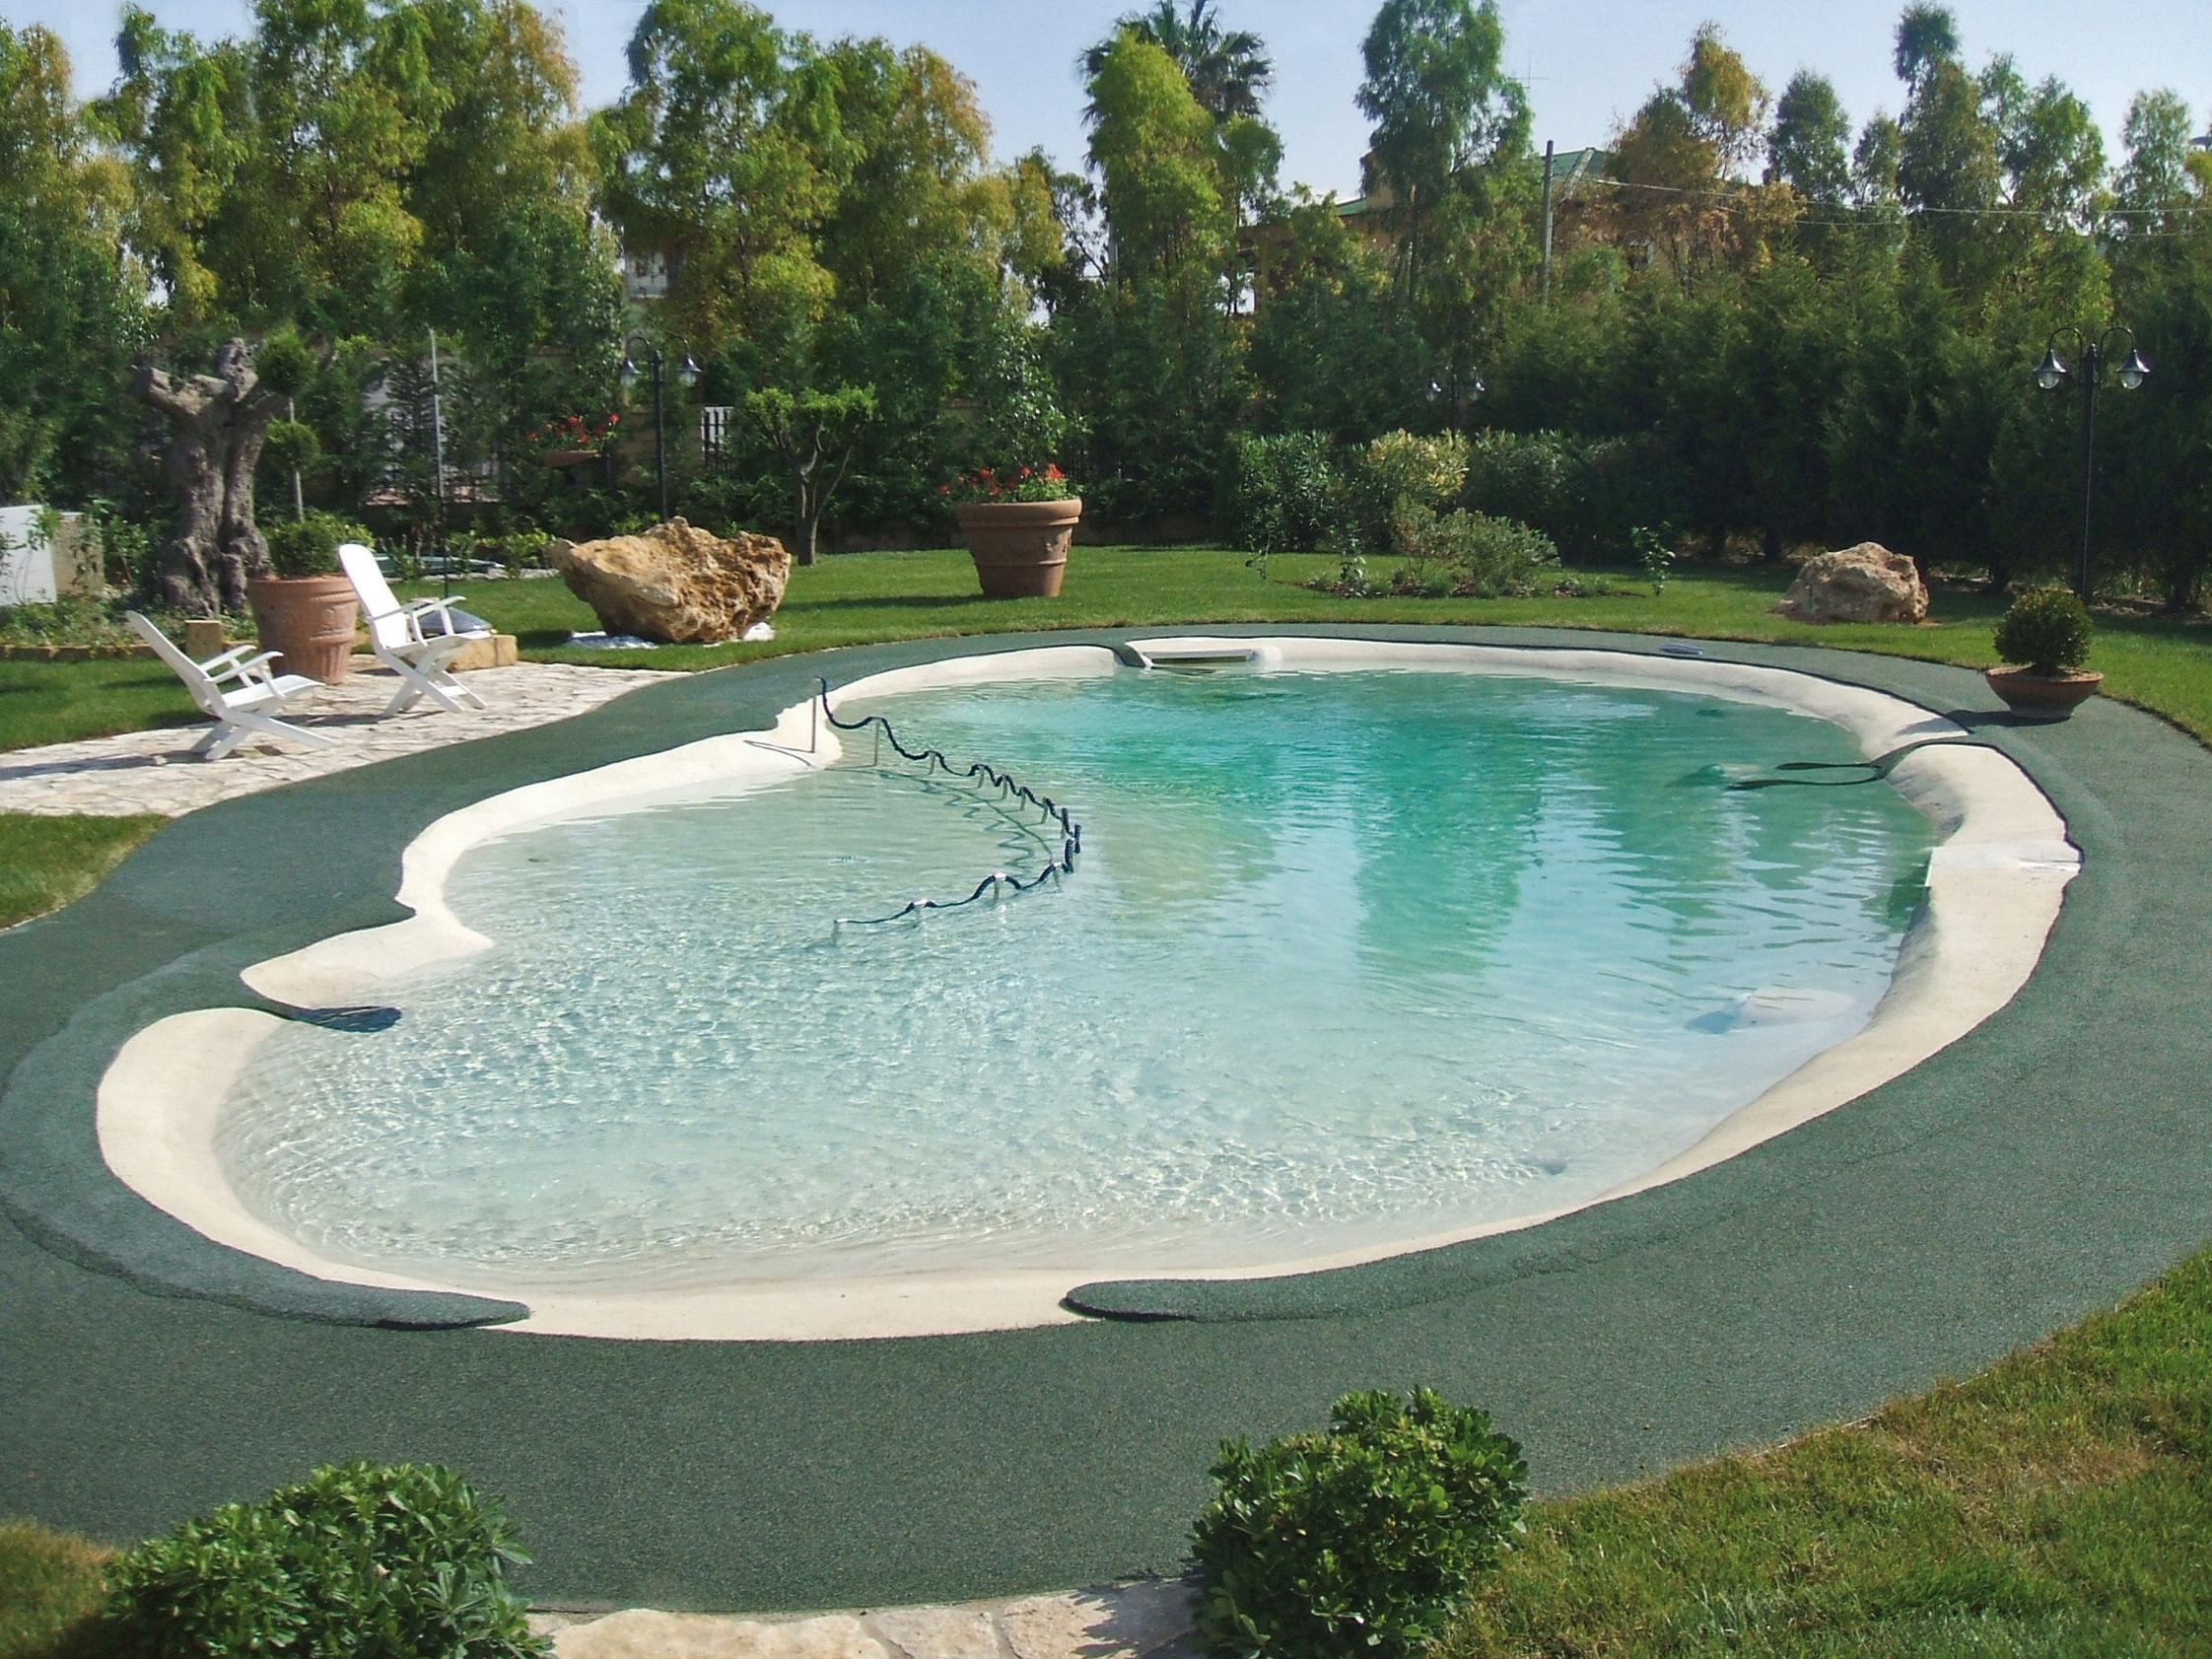 Benza piscine biodesign e biolaghi balneabili - Piscine biodesign ...